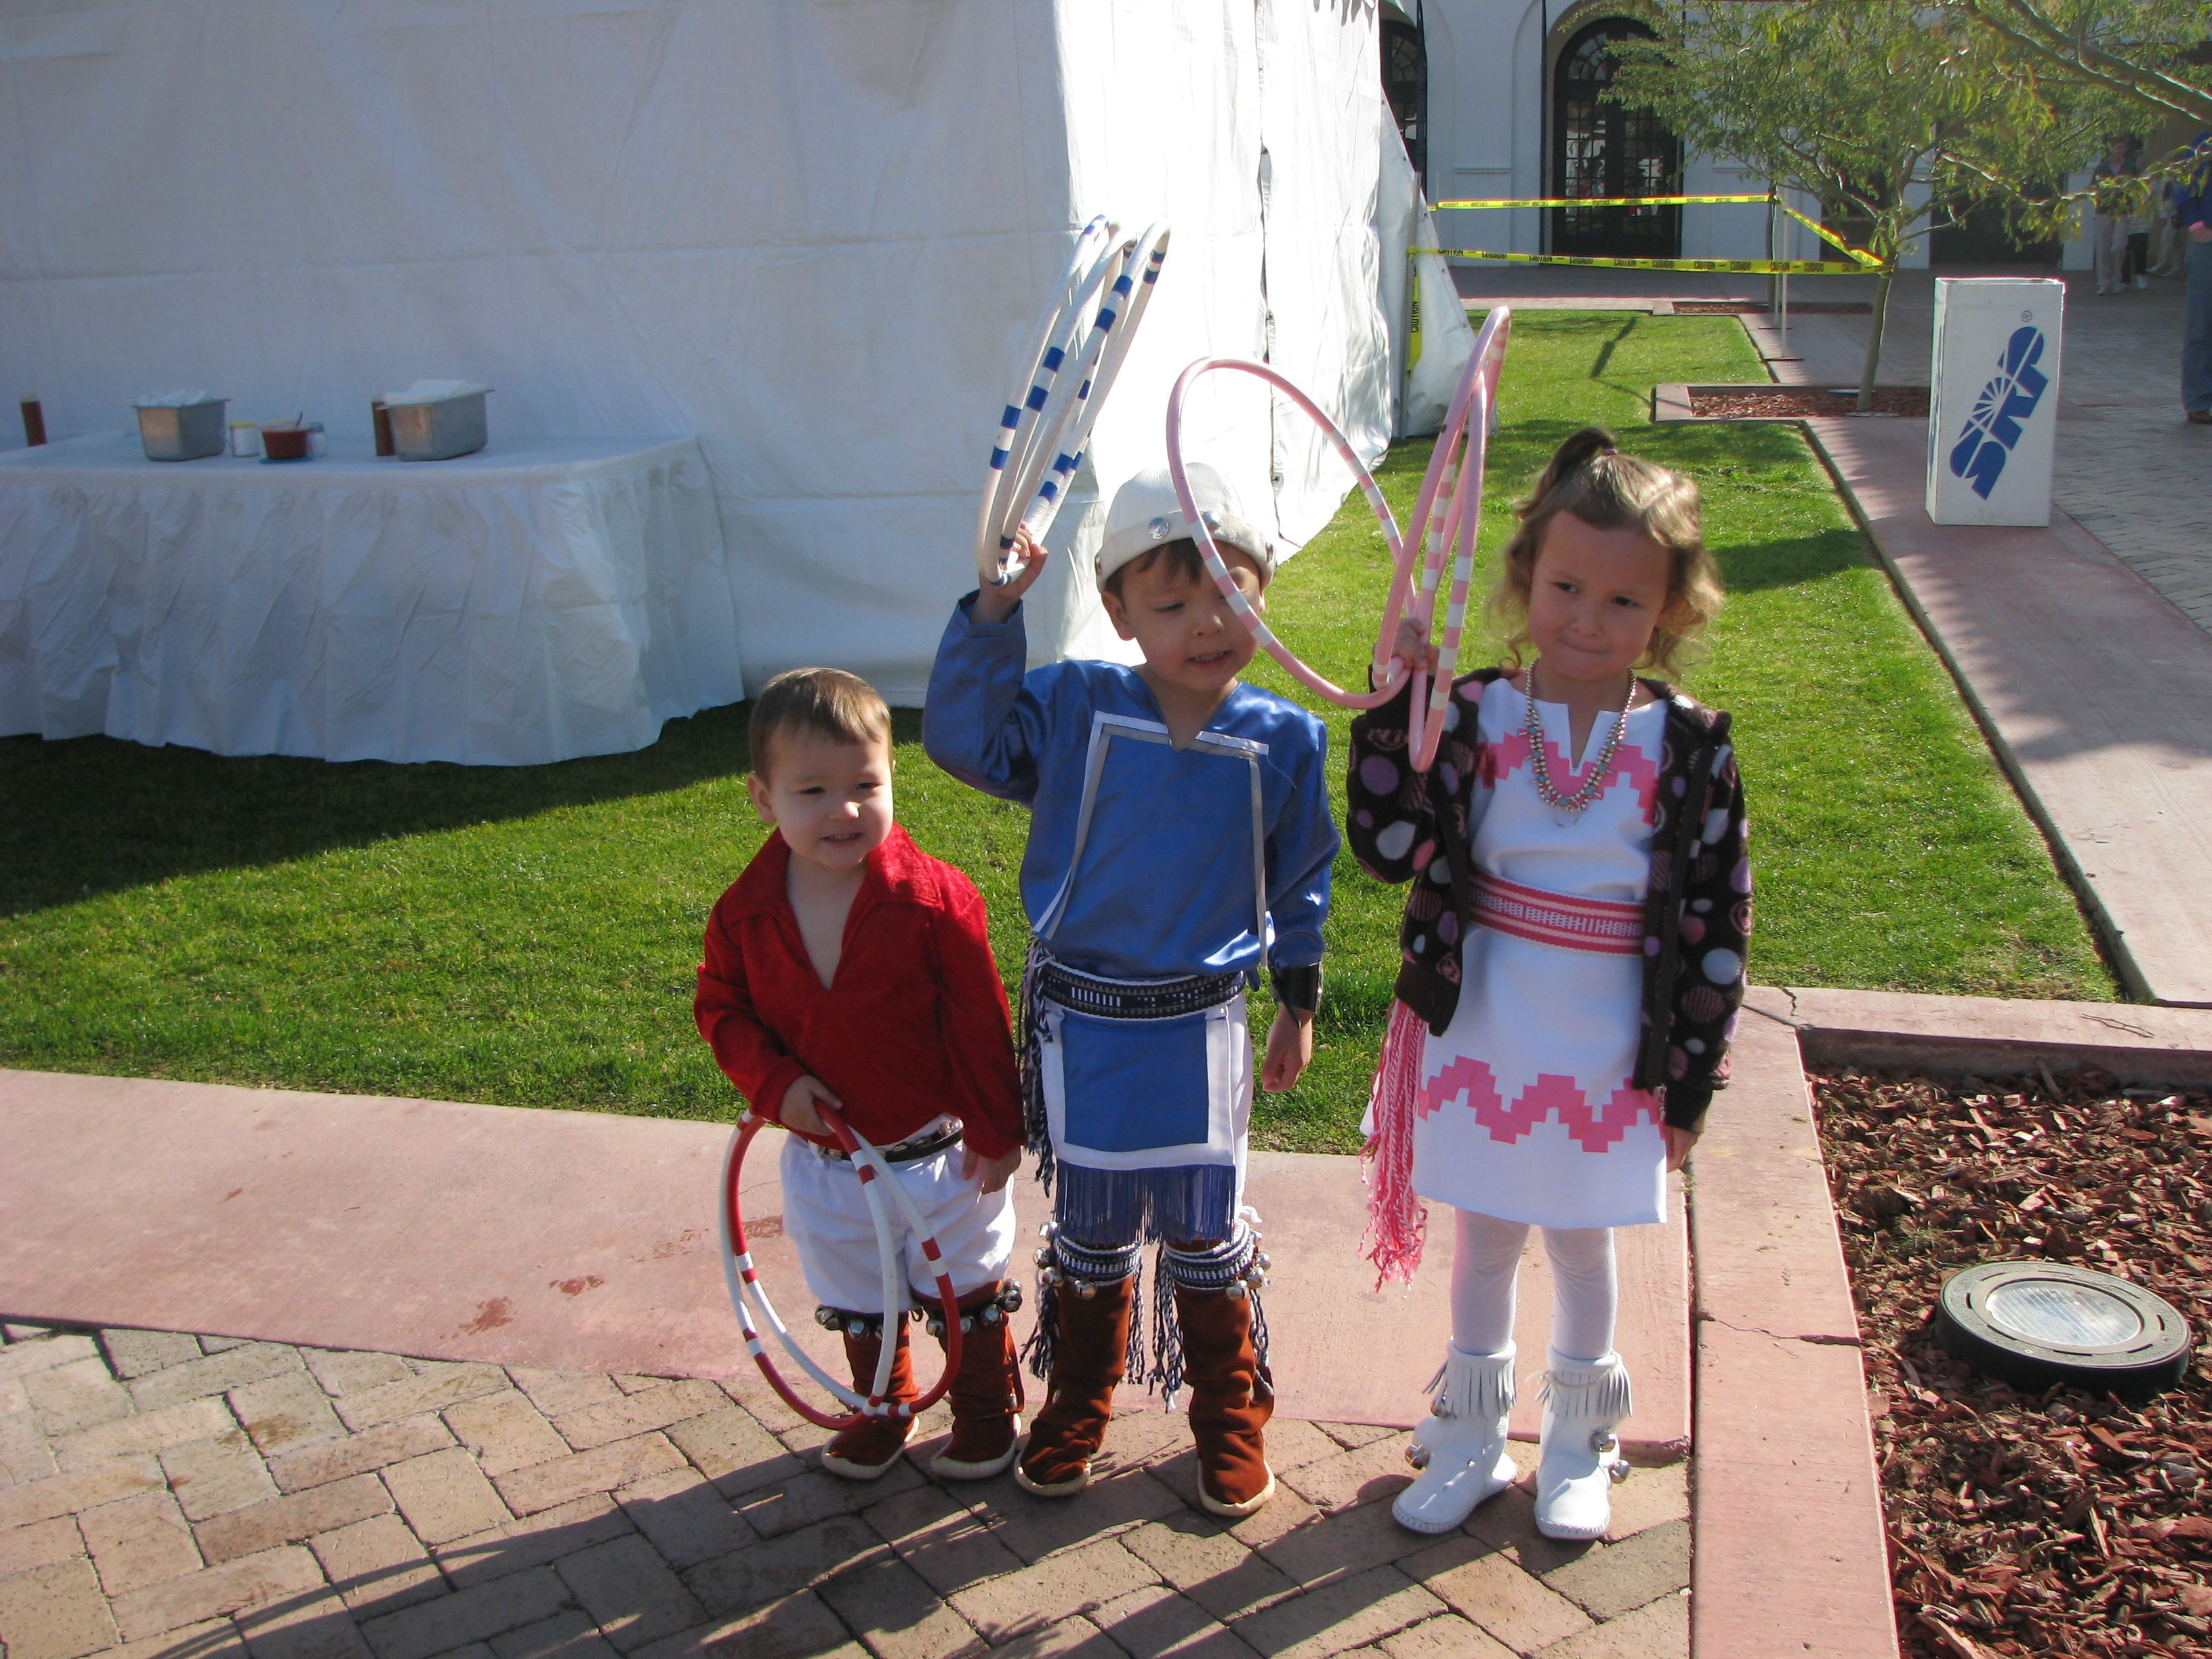 Hoop Dancers in Training - Heard Museum Phoenix